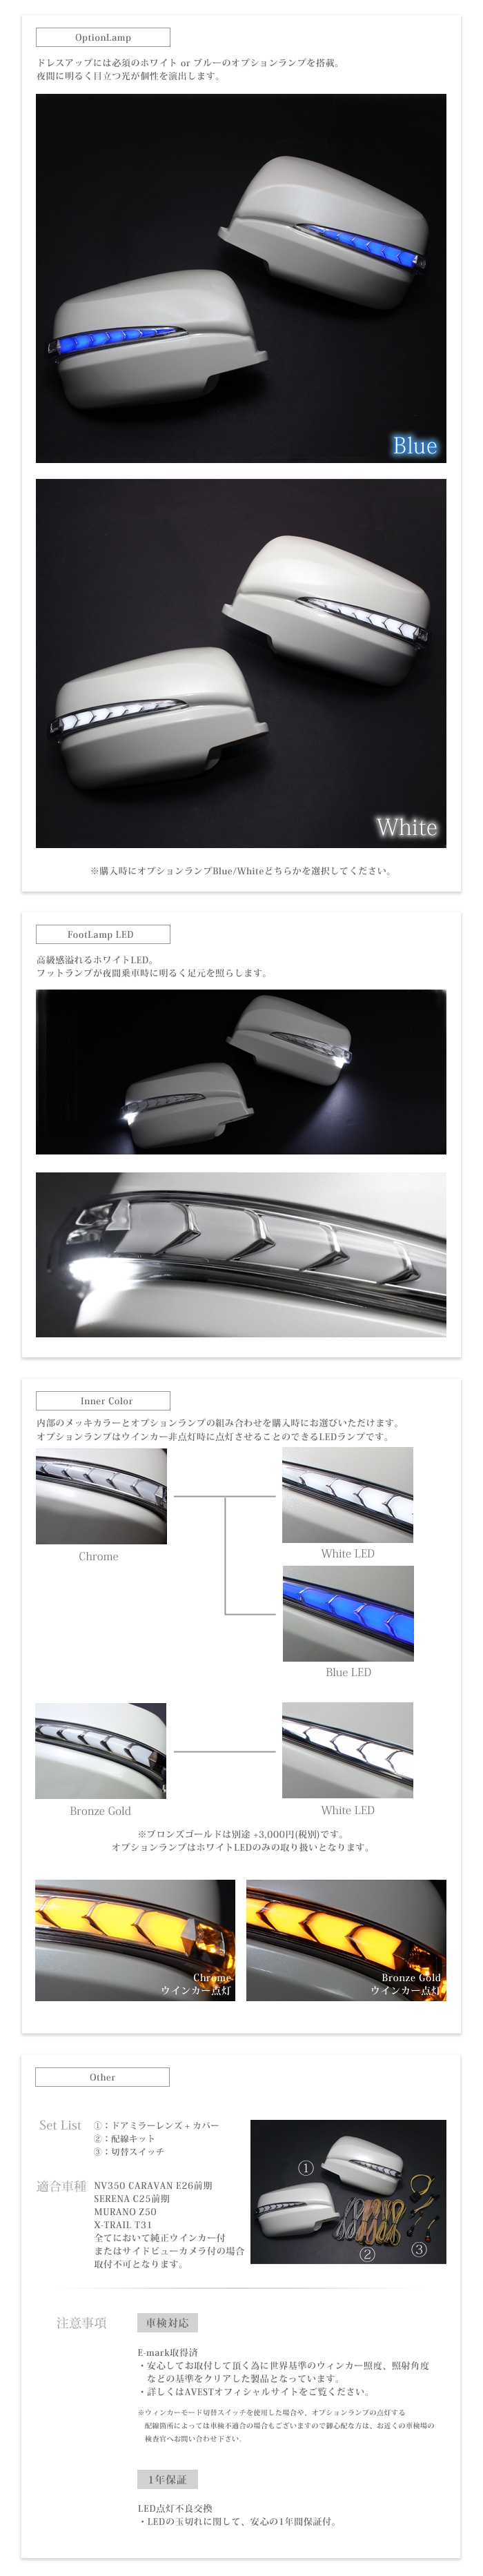 NV350キャラバン/セレナ/流れる ドアミラーウインカー